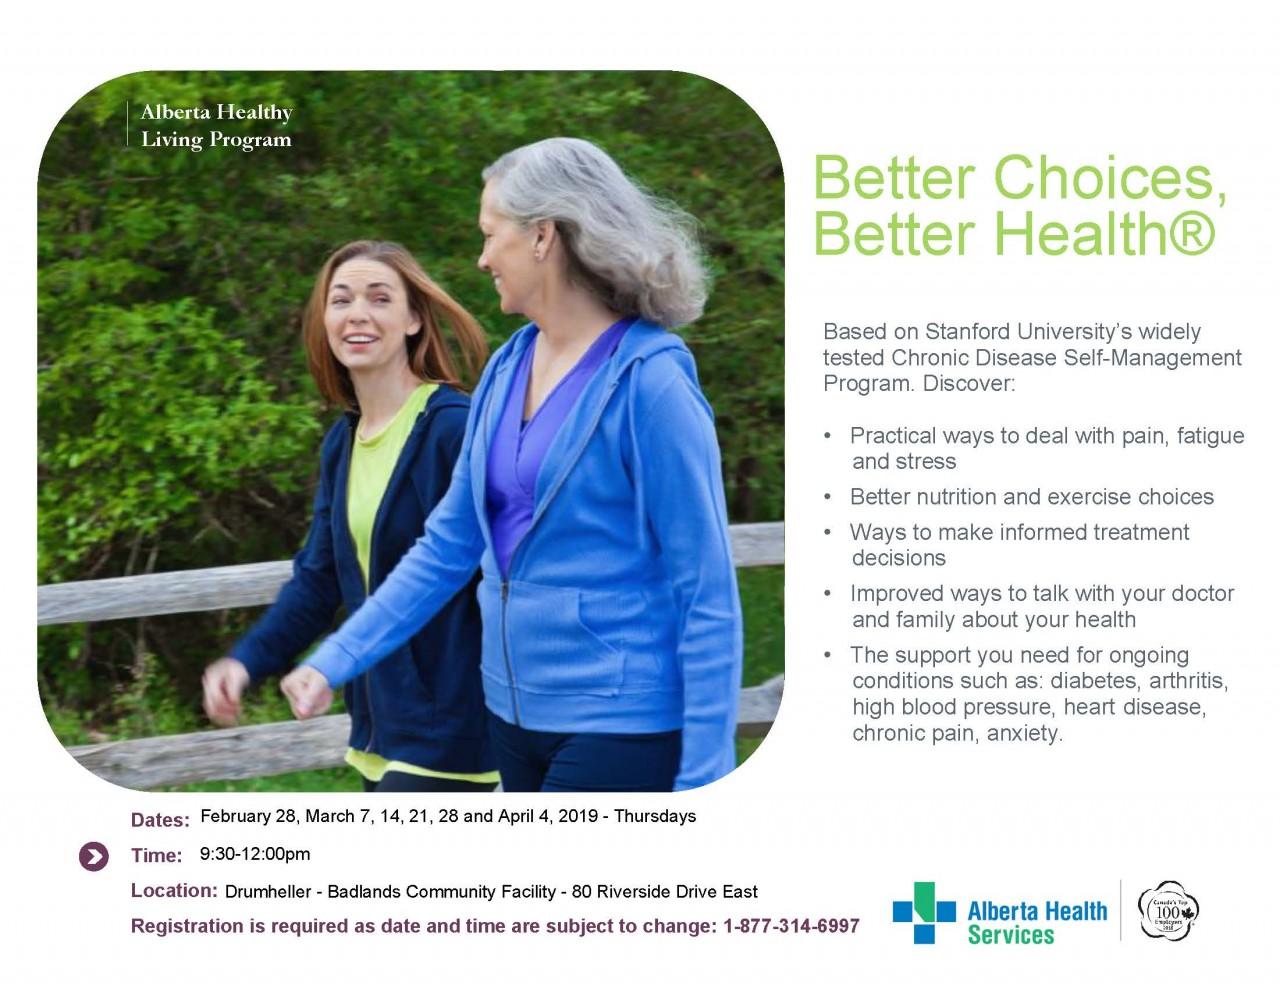 Better-Choices-Better-Health---Drumheller-Feb-28-2019